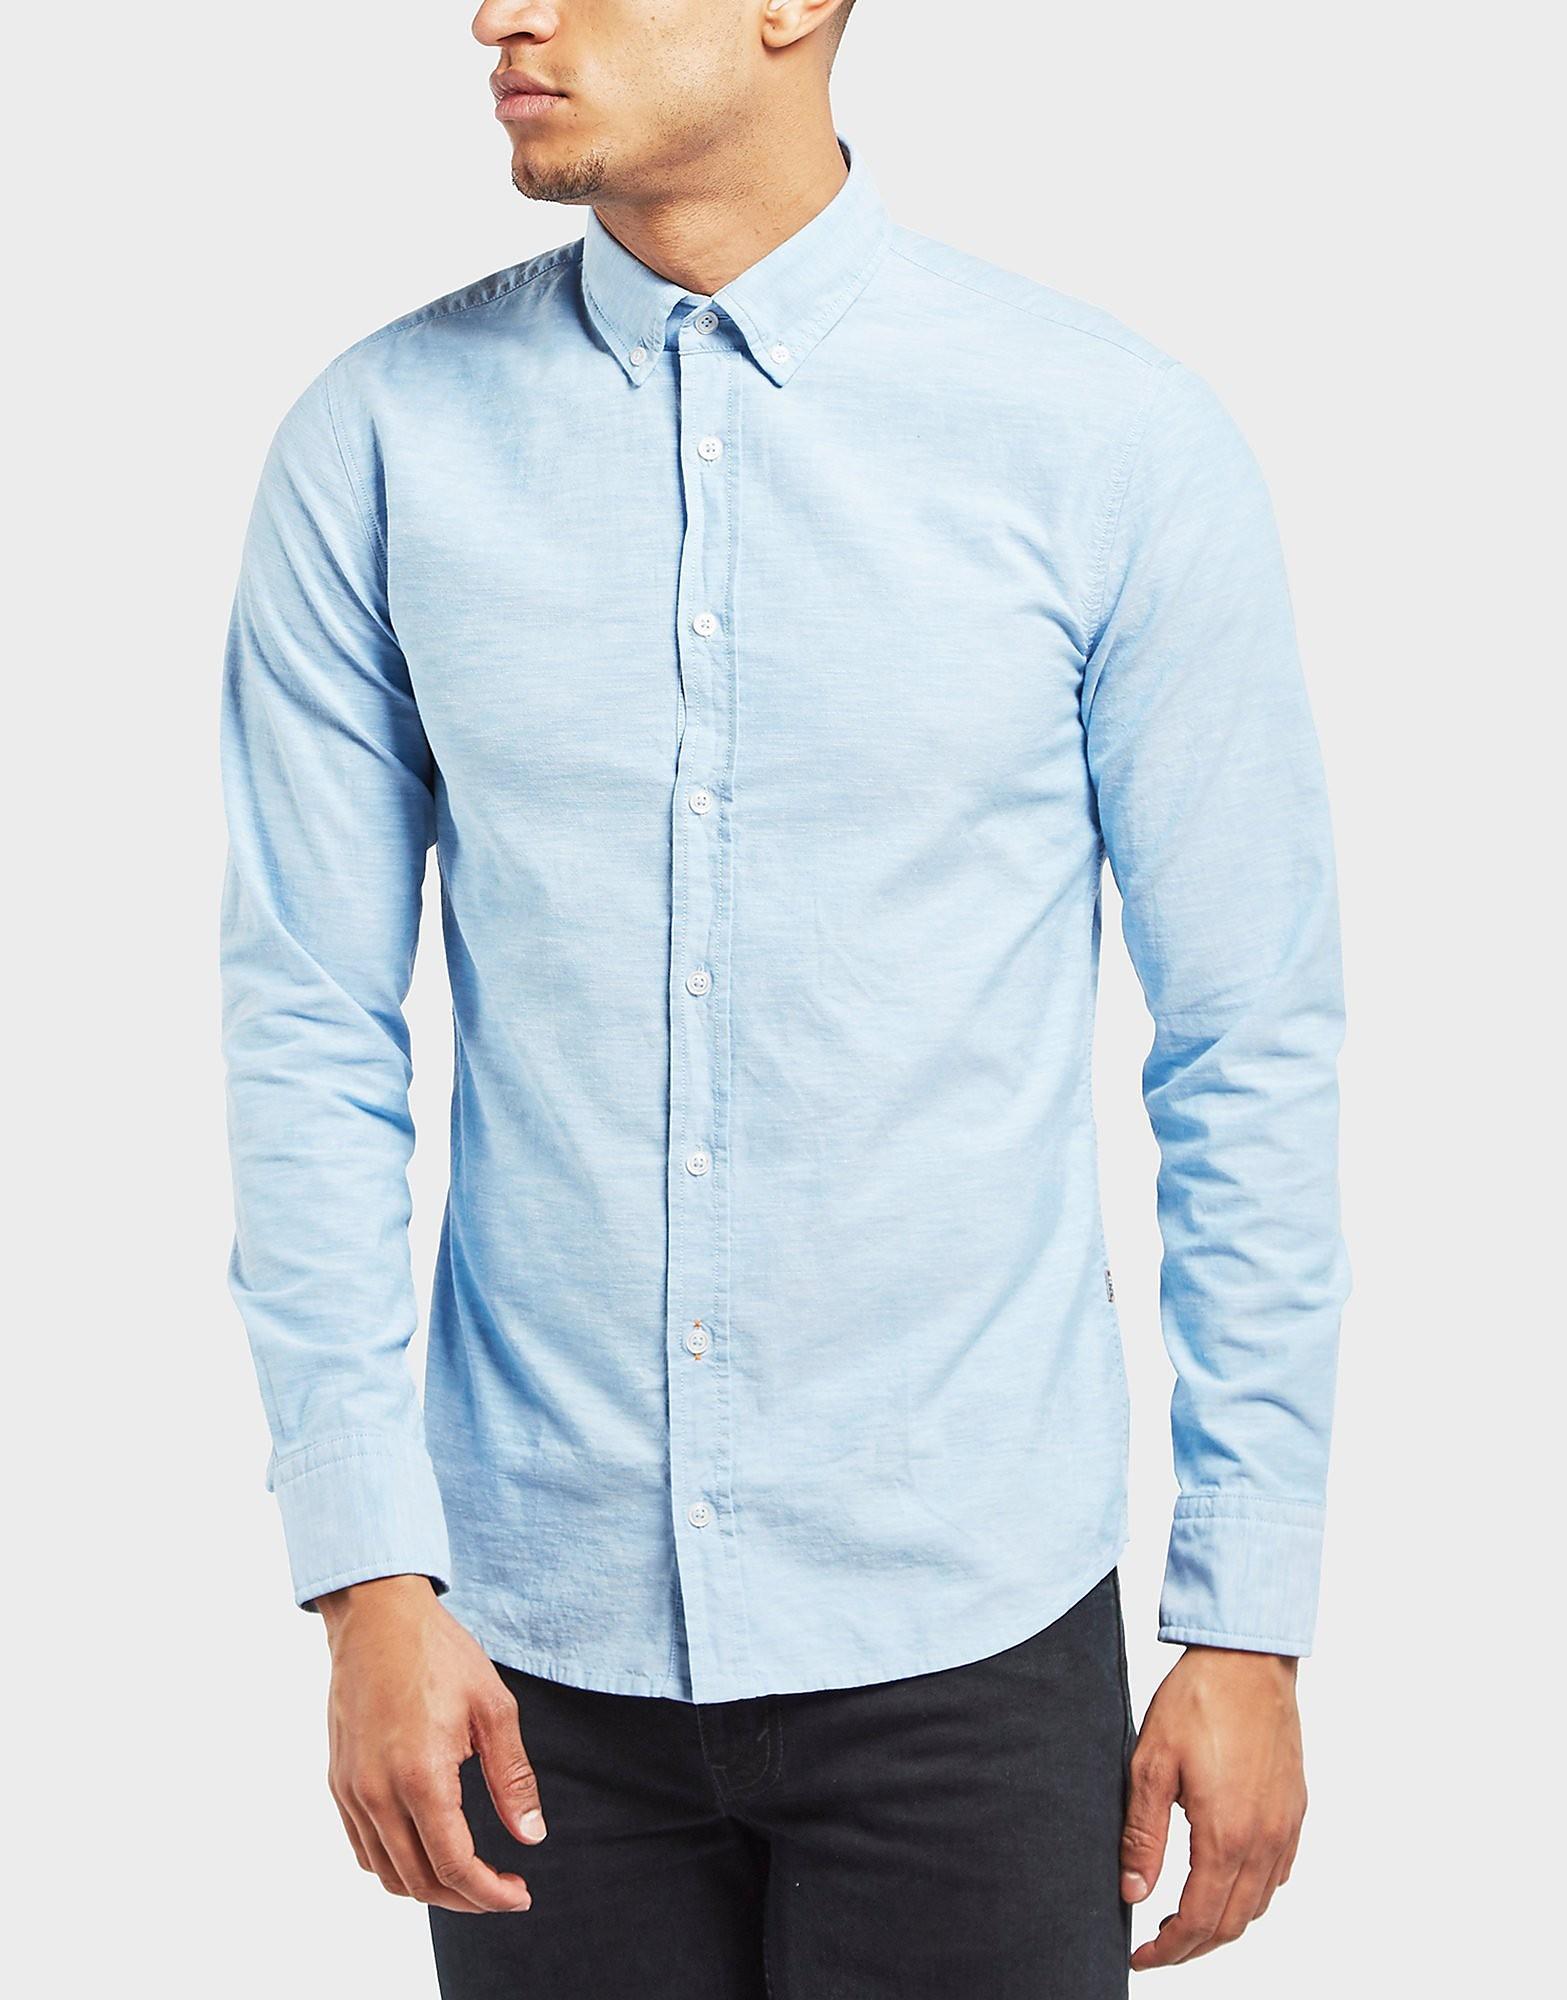 BOSS Orange Preppy Oxford Long Sleeve Shirt